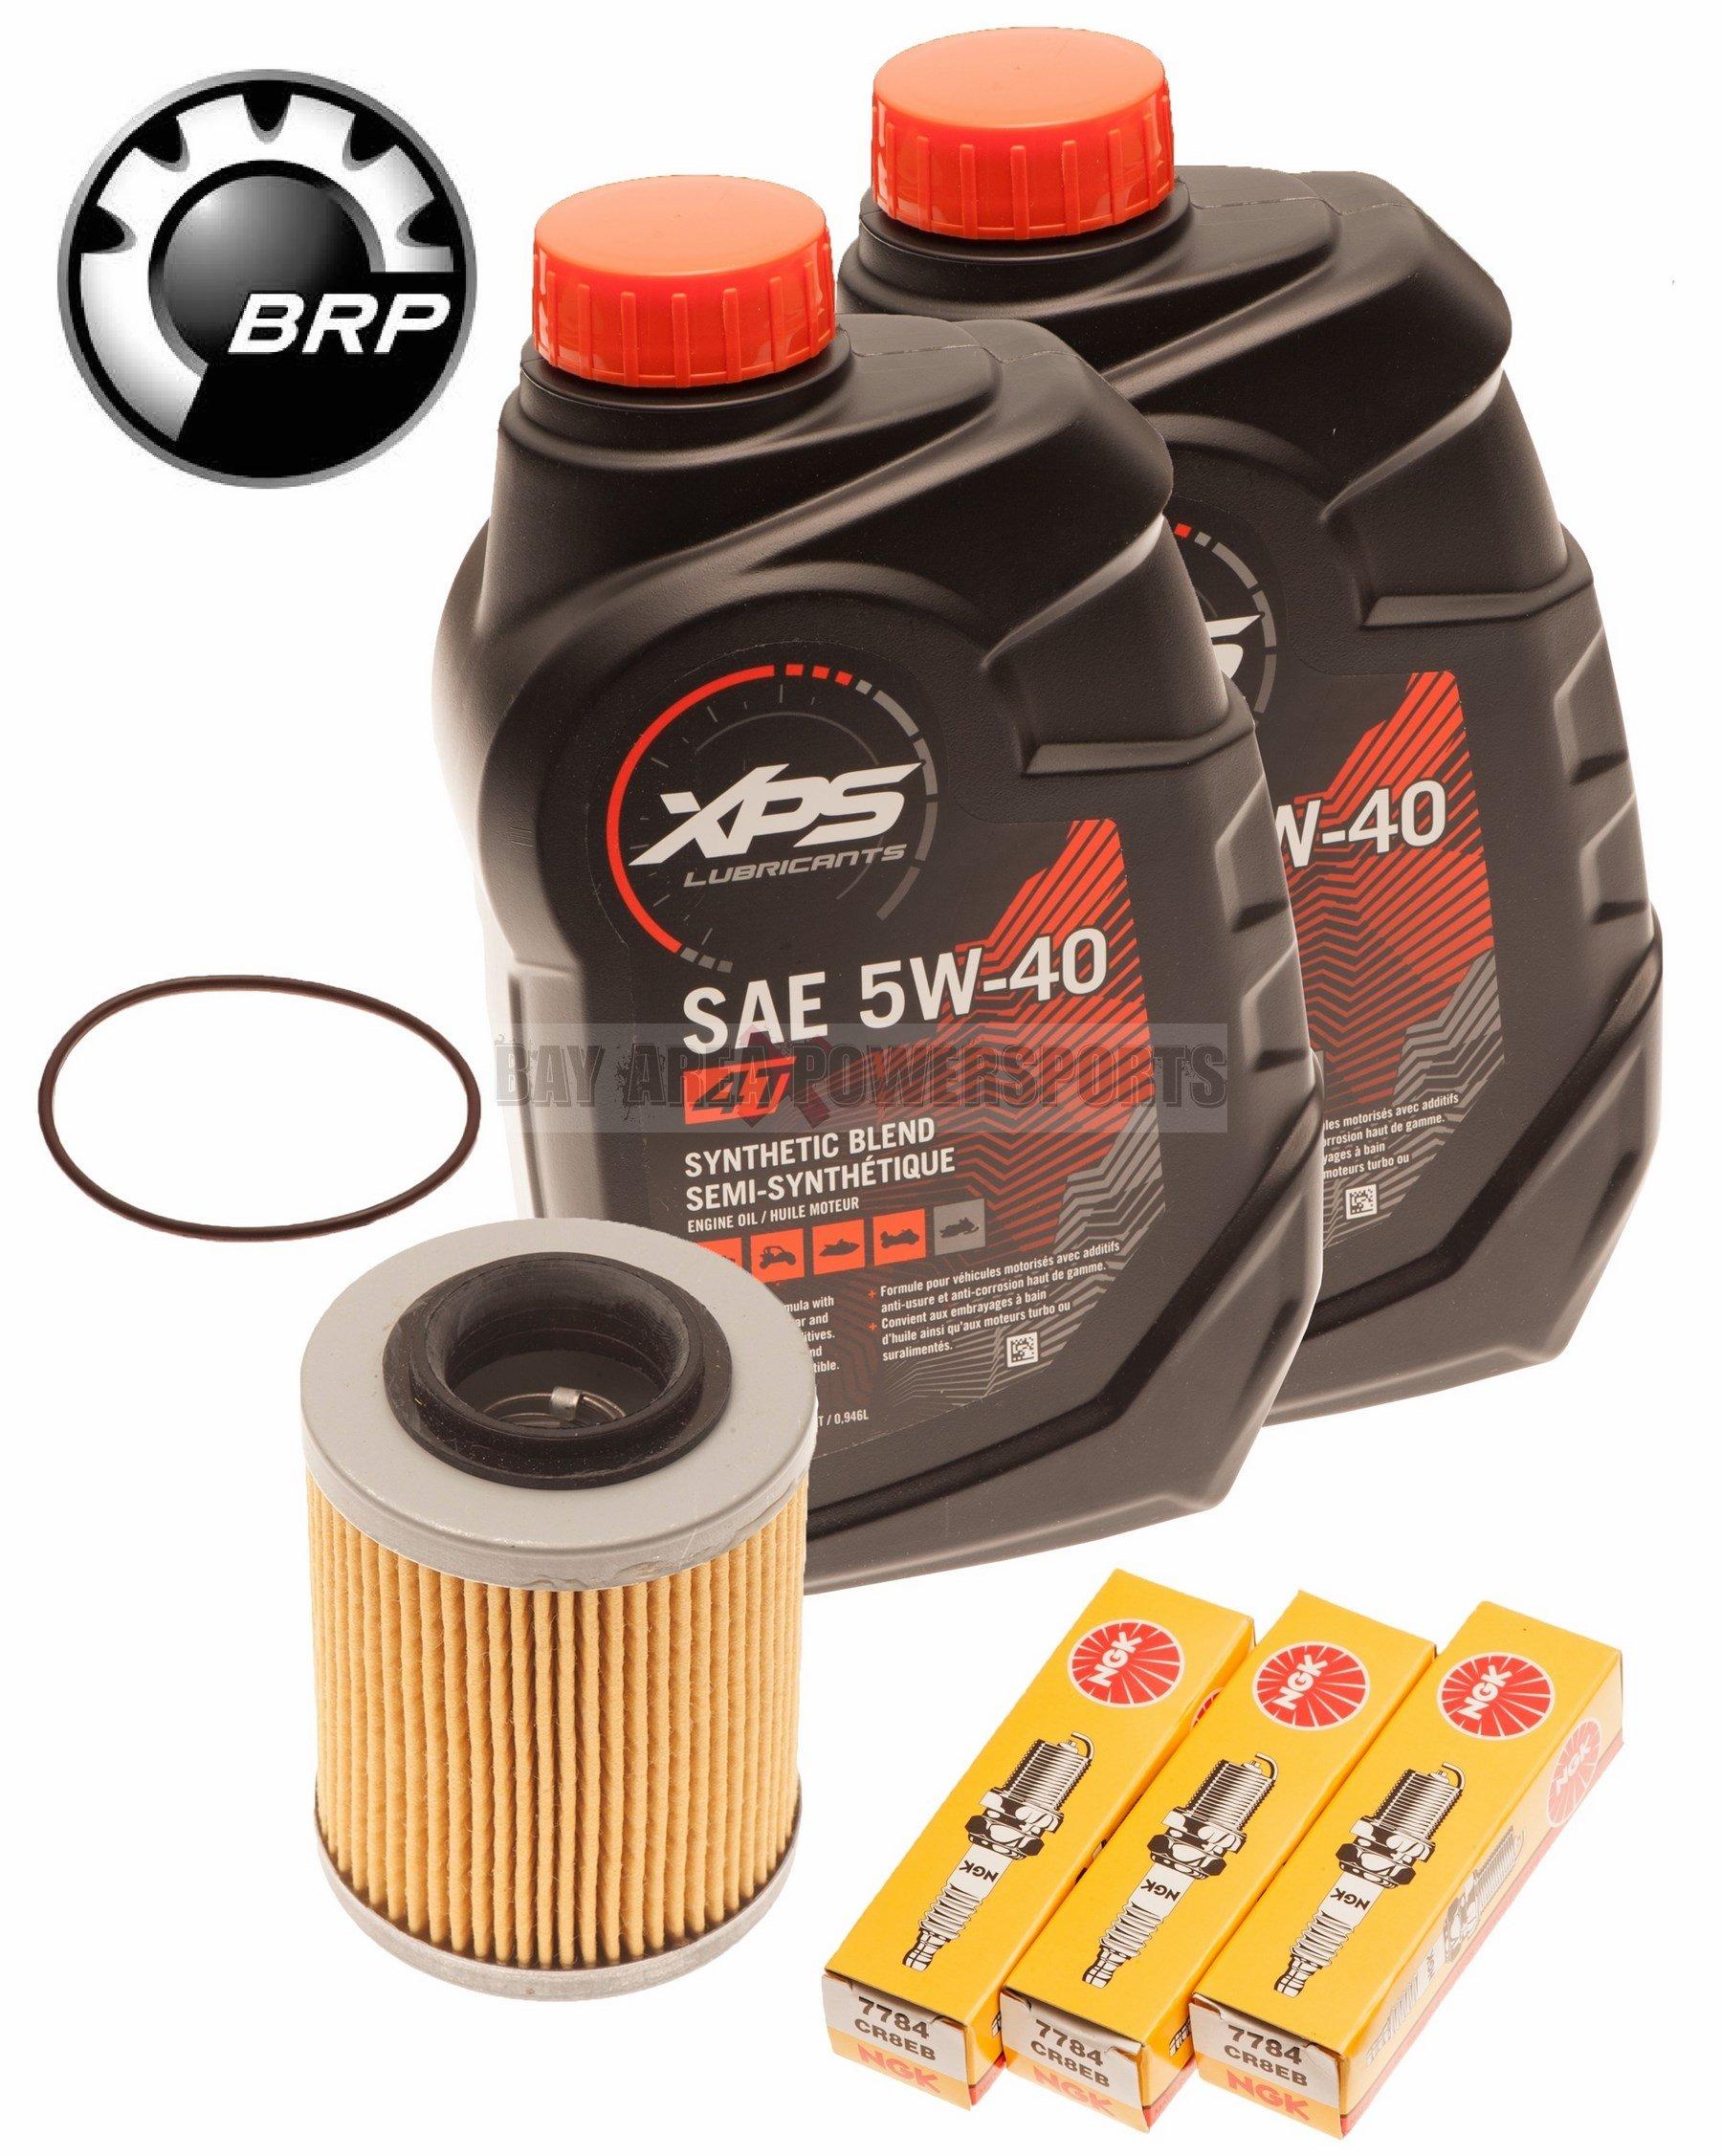 Sea Doo Spark 900 Oil Change Kit W/ Filter O-Ring & NGK Spark Plugs